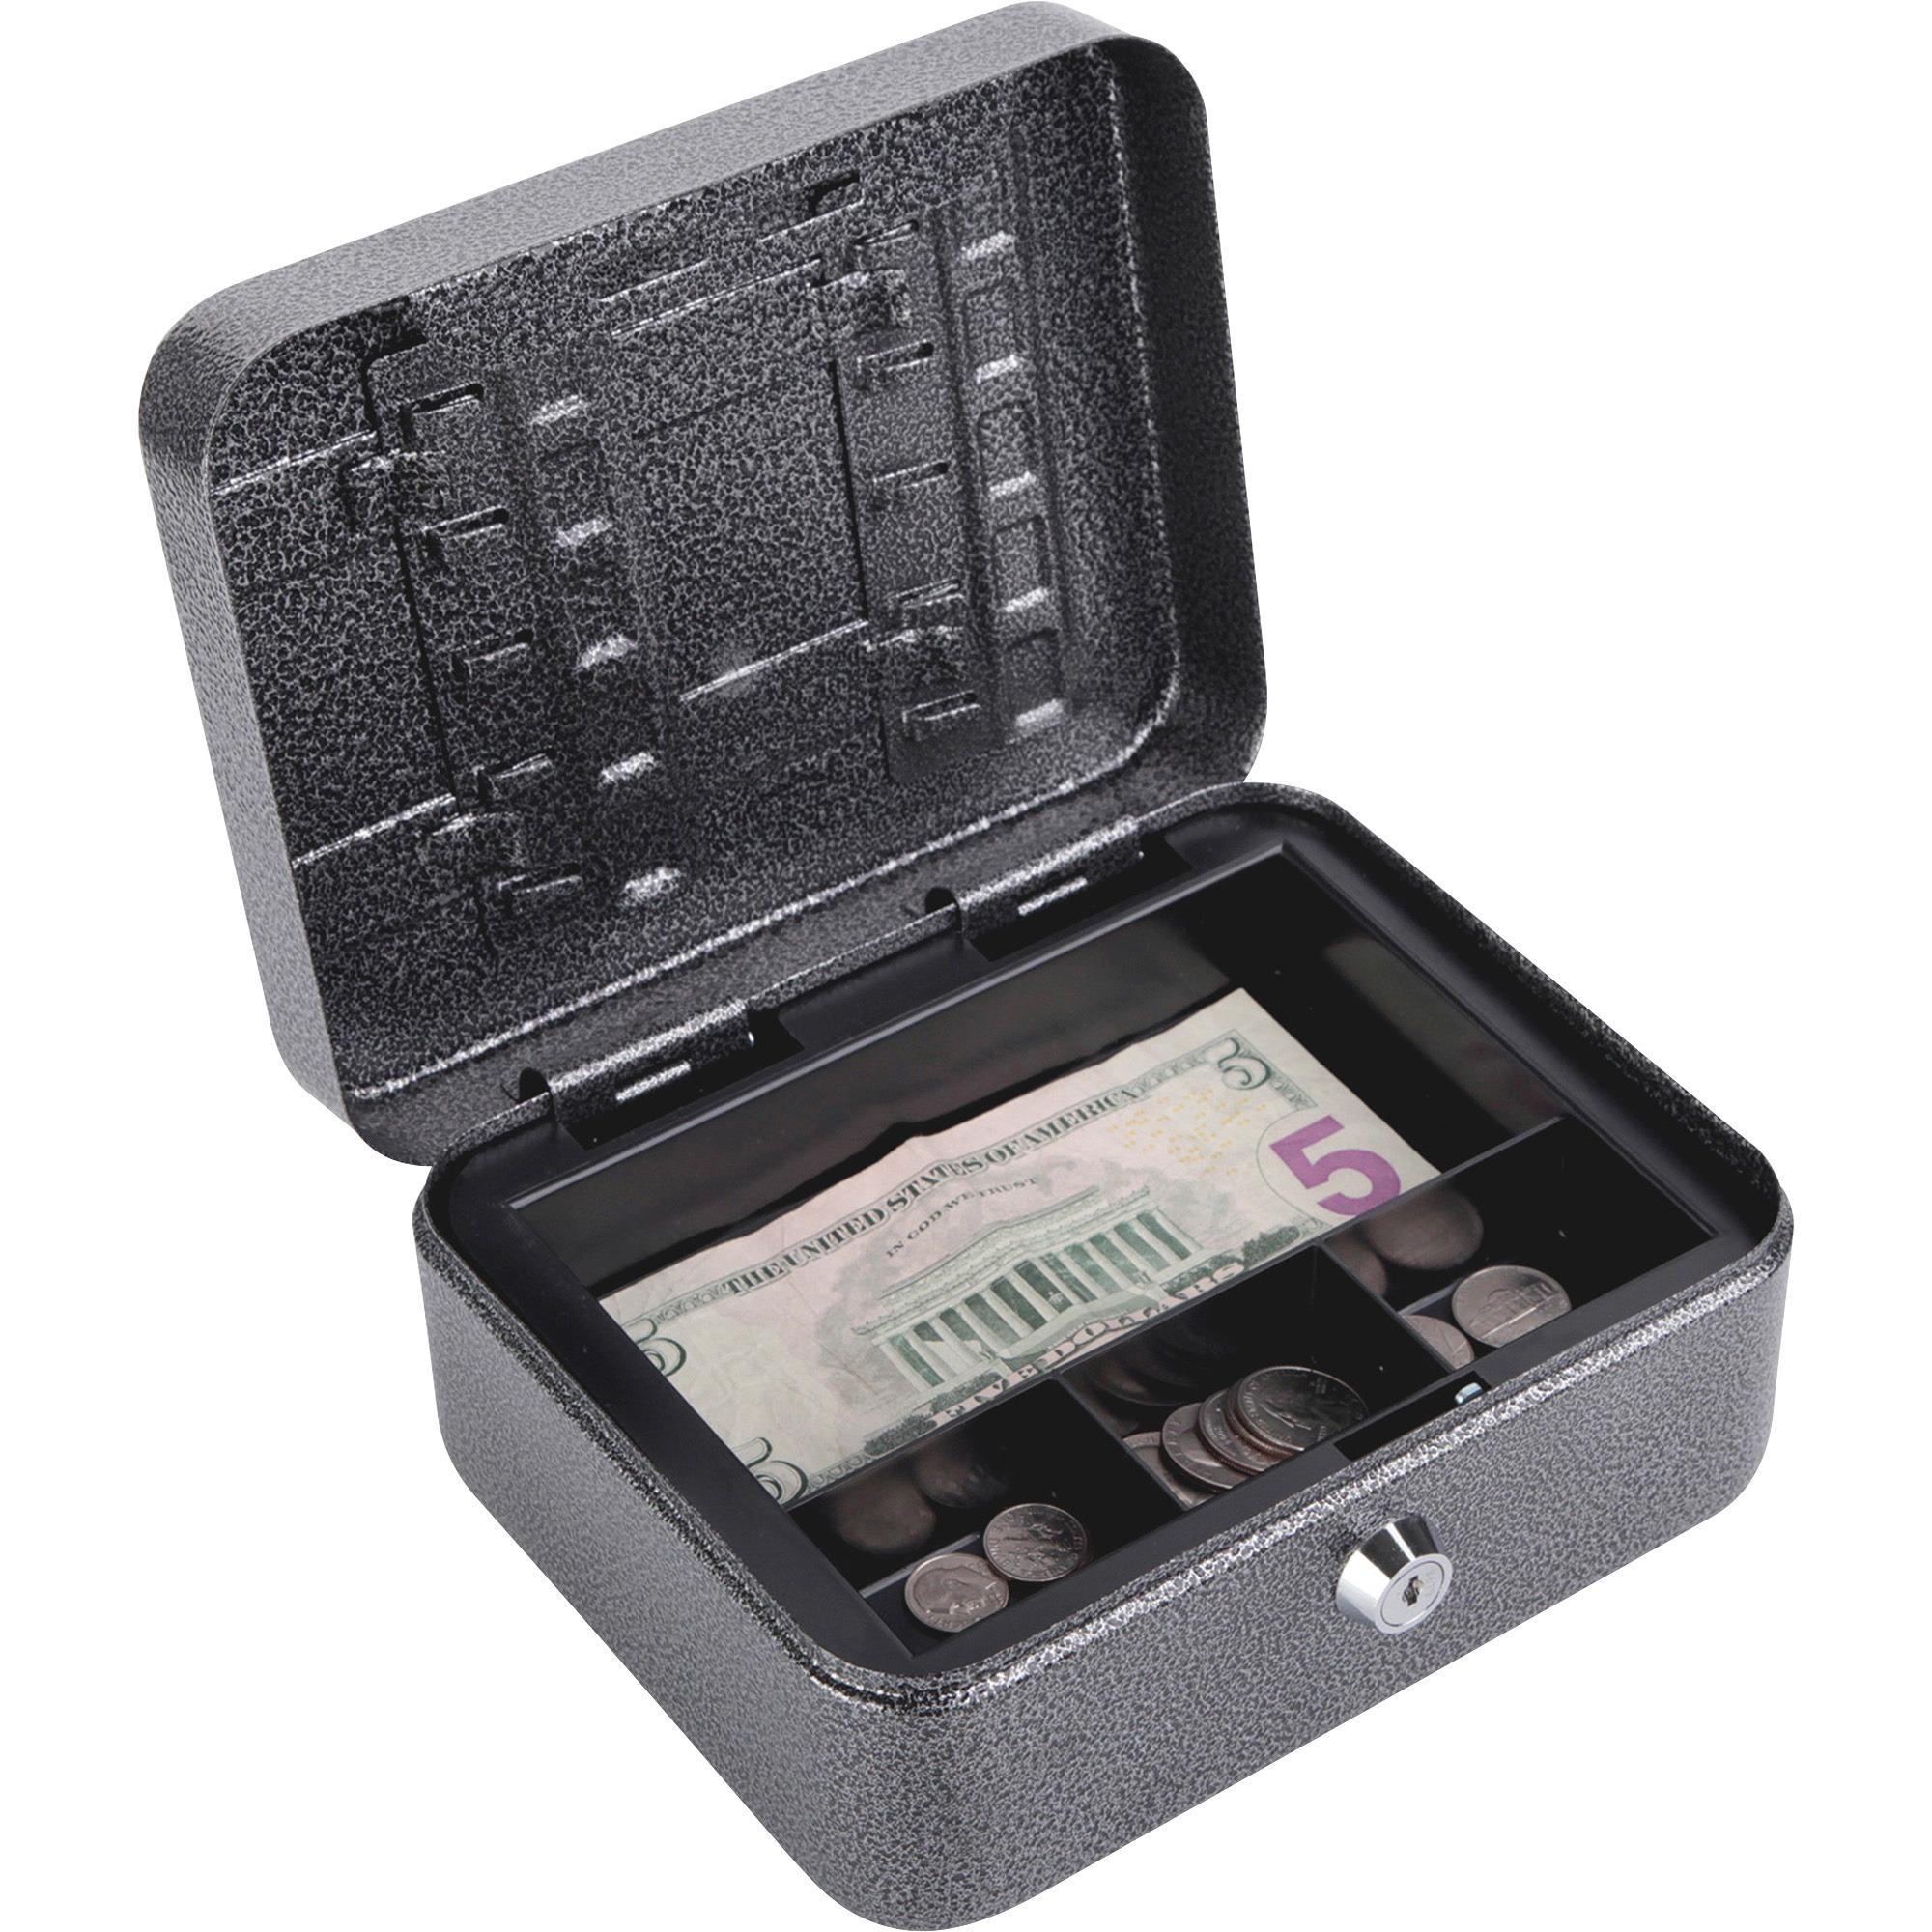 FireKing, FIRCB0806, CB0806 Locking Convertible Cash Key Box, 1 Each, Silver,Black